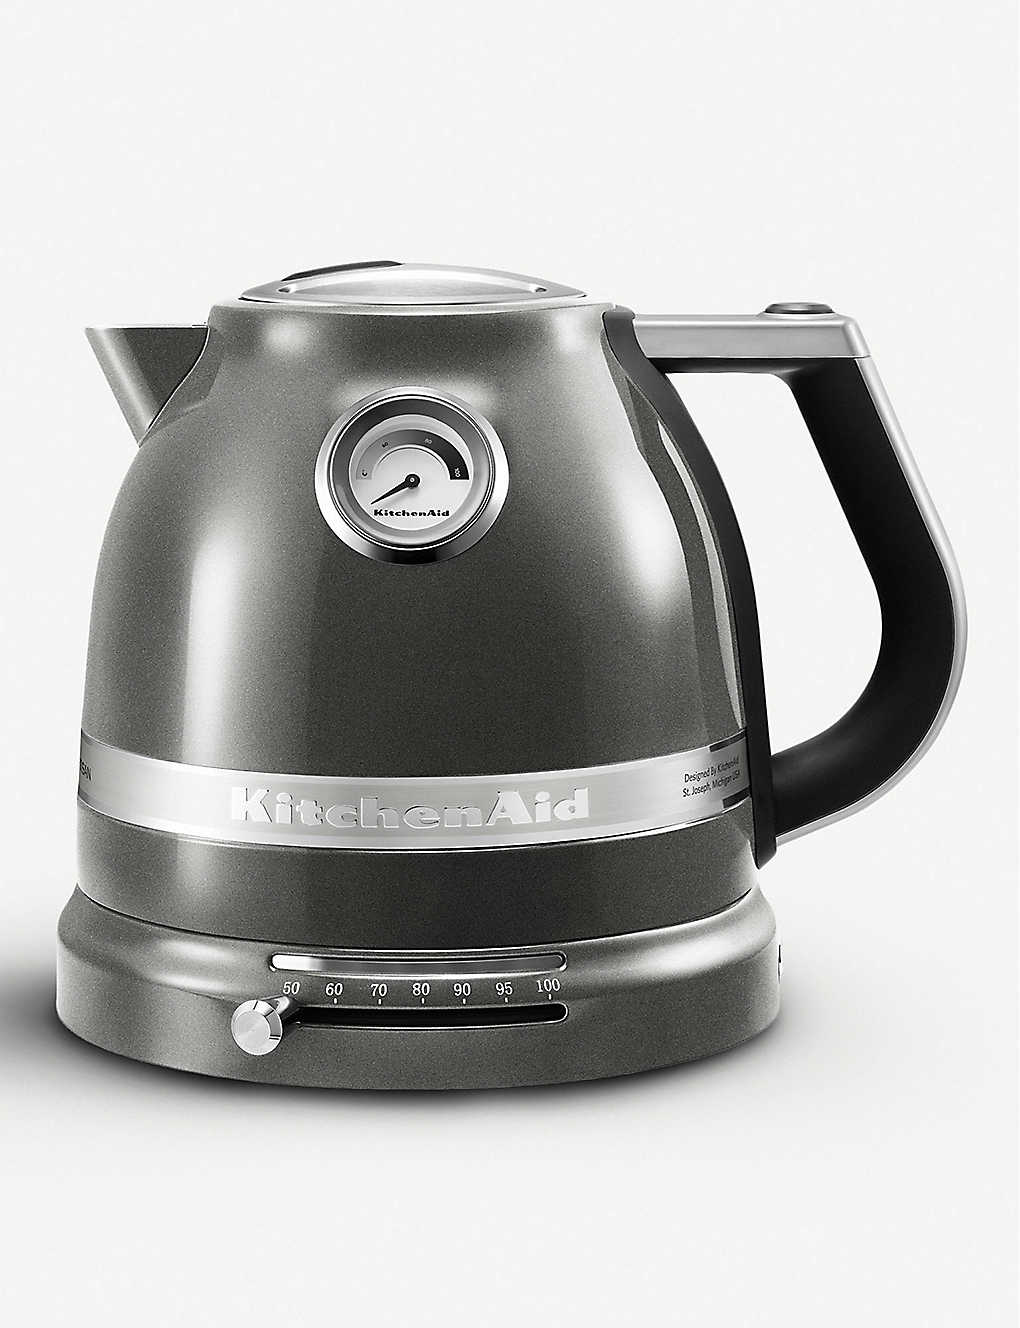 KITCHENAID Silver Artisan kettle